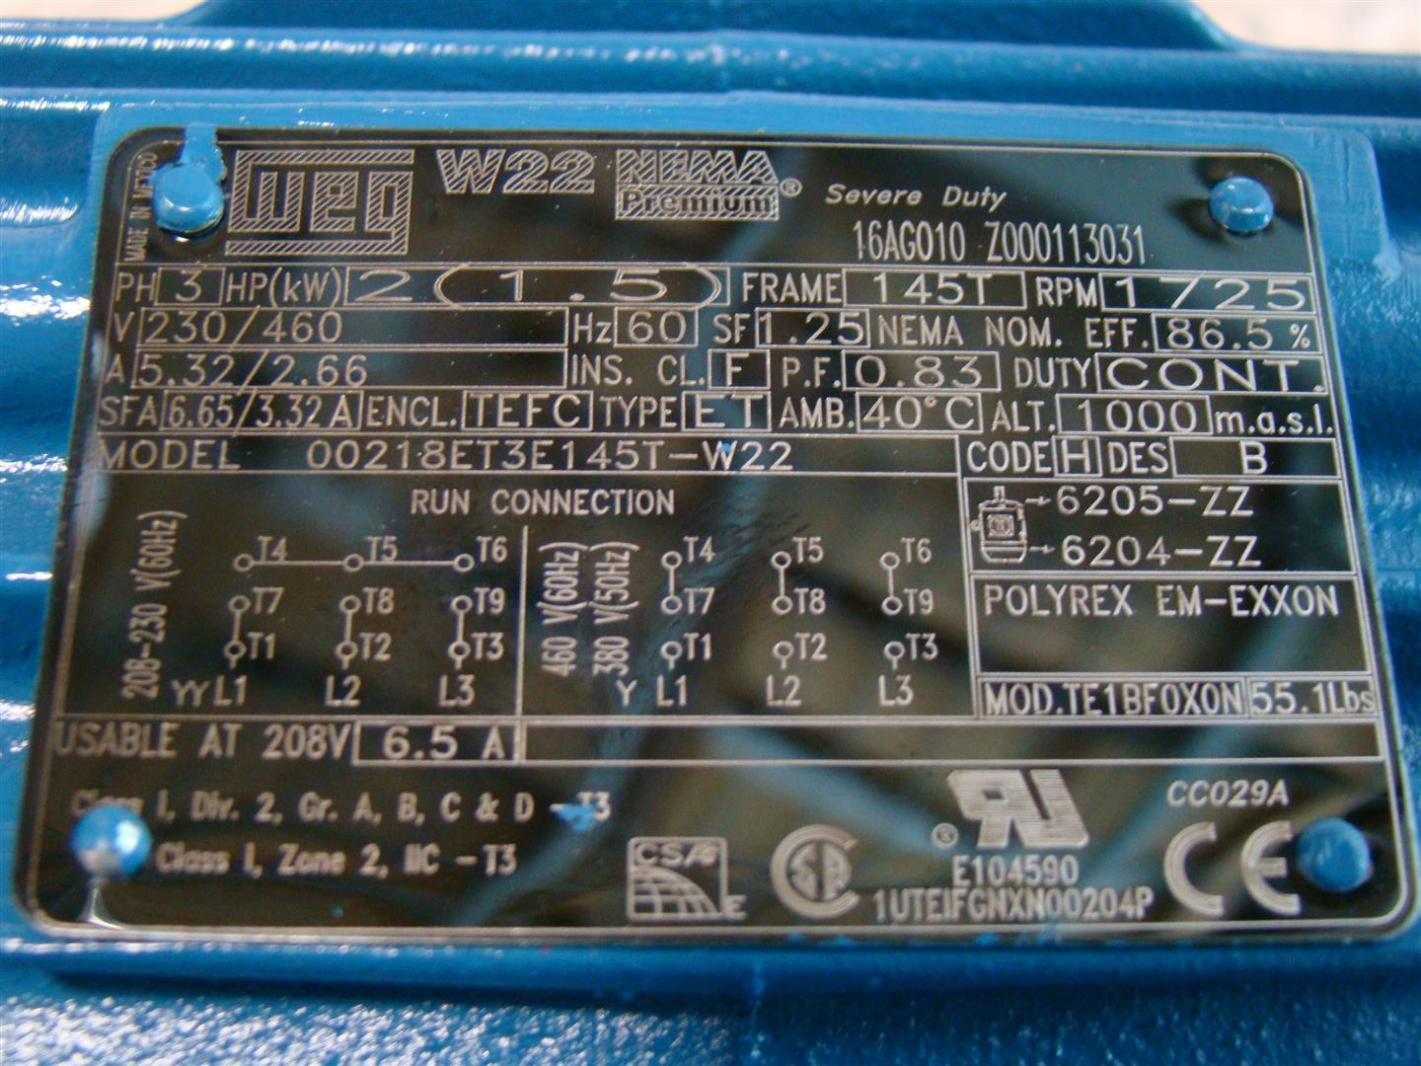 ahw110 weg w22 premium 2hp motor 230 460v 1725rpm 00218et3e145t w22 2 weg w22 motor wiring diagram ewiring weg w22 motor wiring diagram at honlapkeszites.co